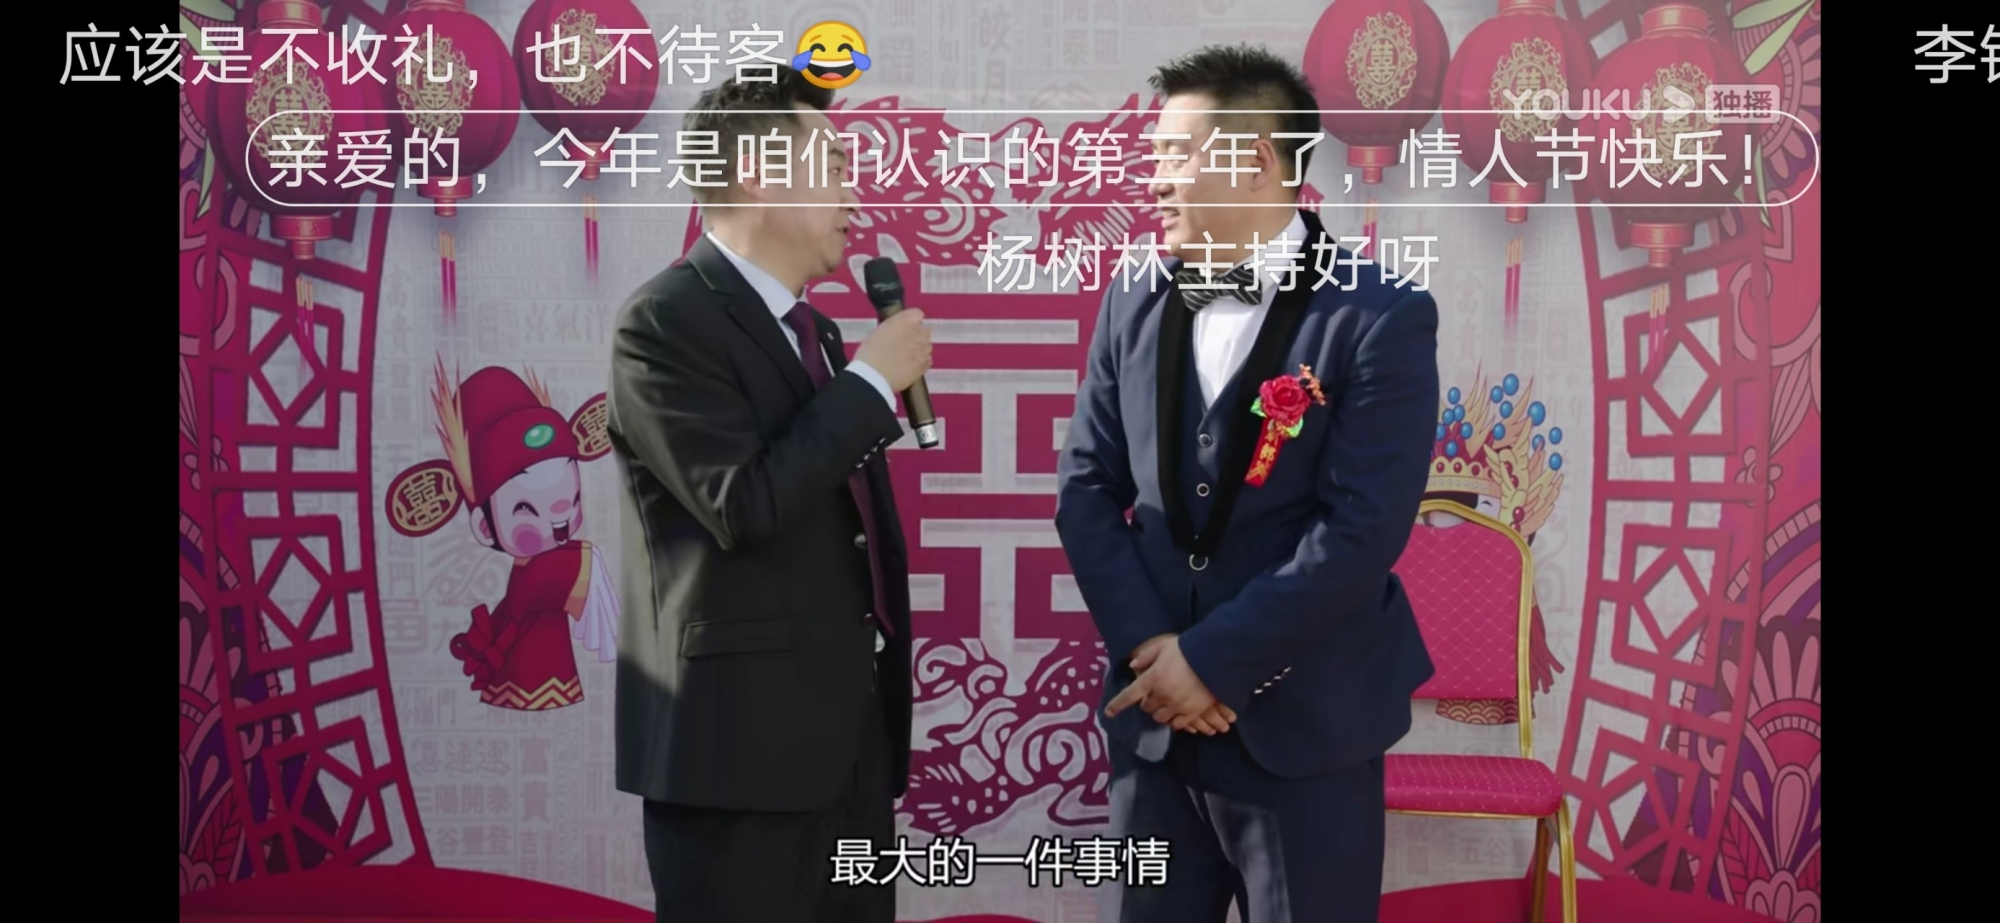 Screenshot_20200213_235825_com.huawei.himovie.jpg